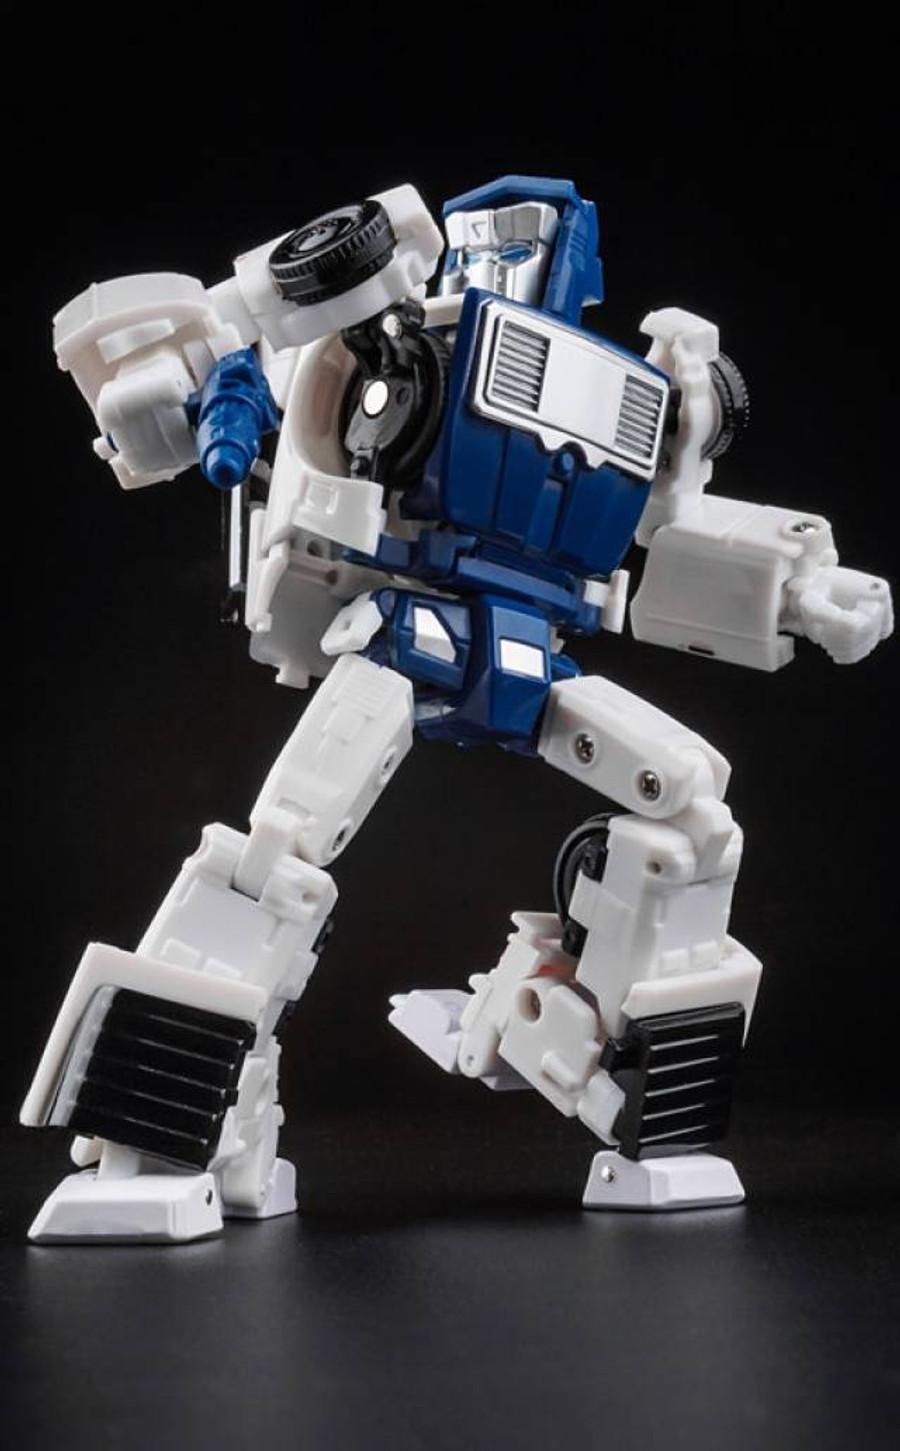 X-Transbots - MM-VI Boost & MM-VII Hatch Set